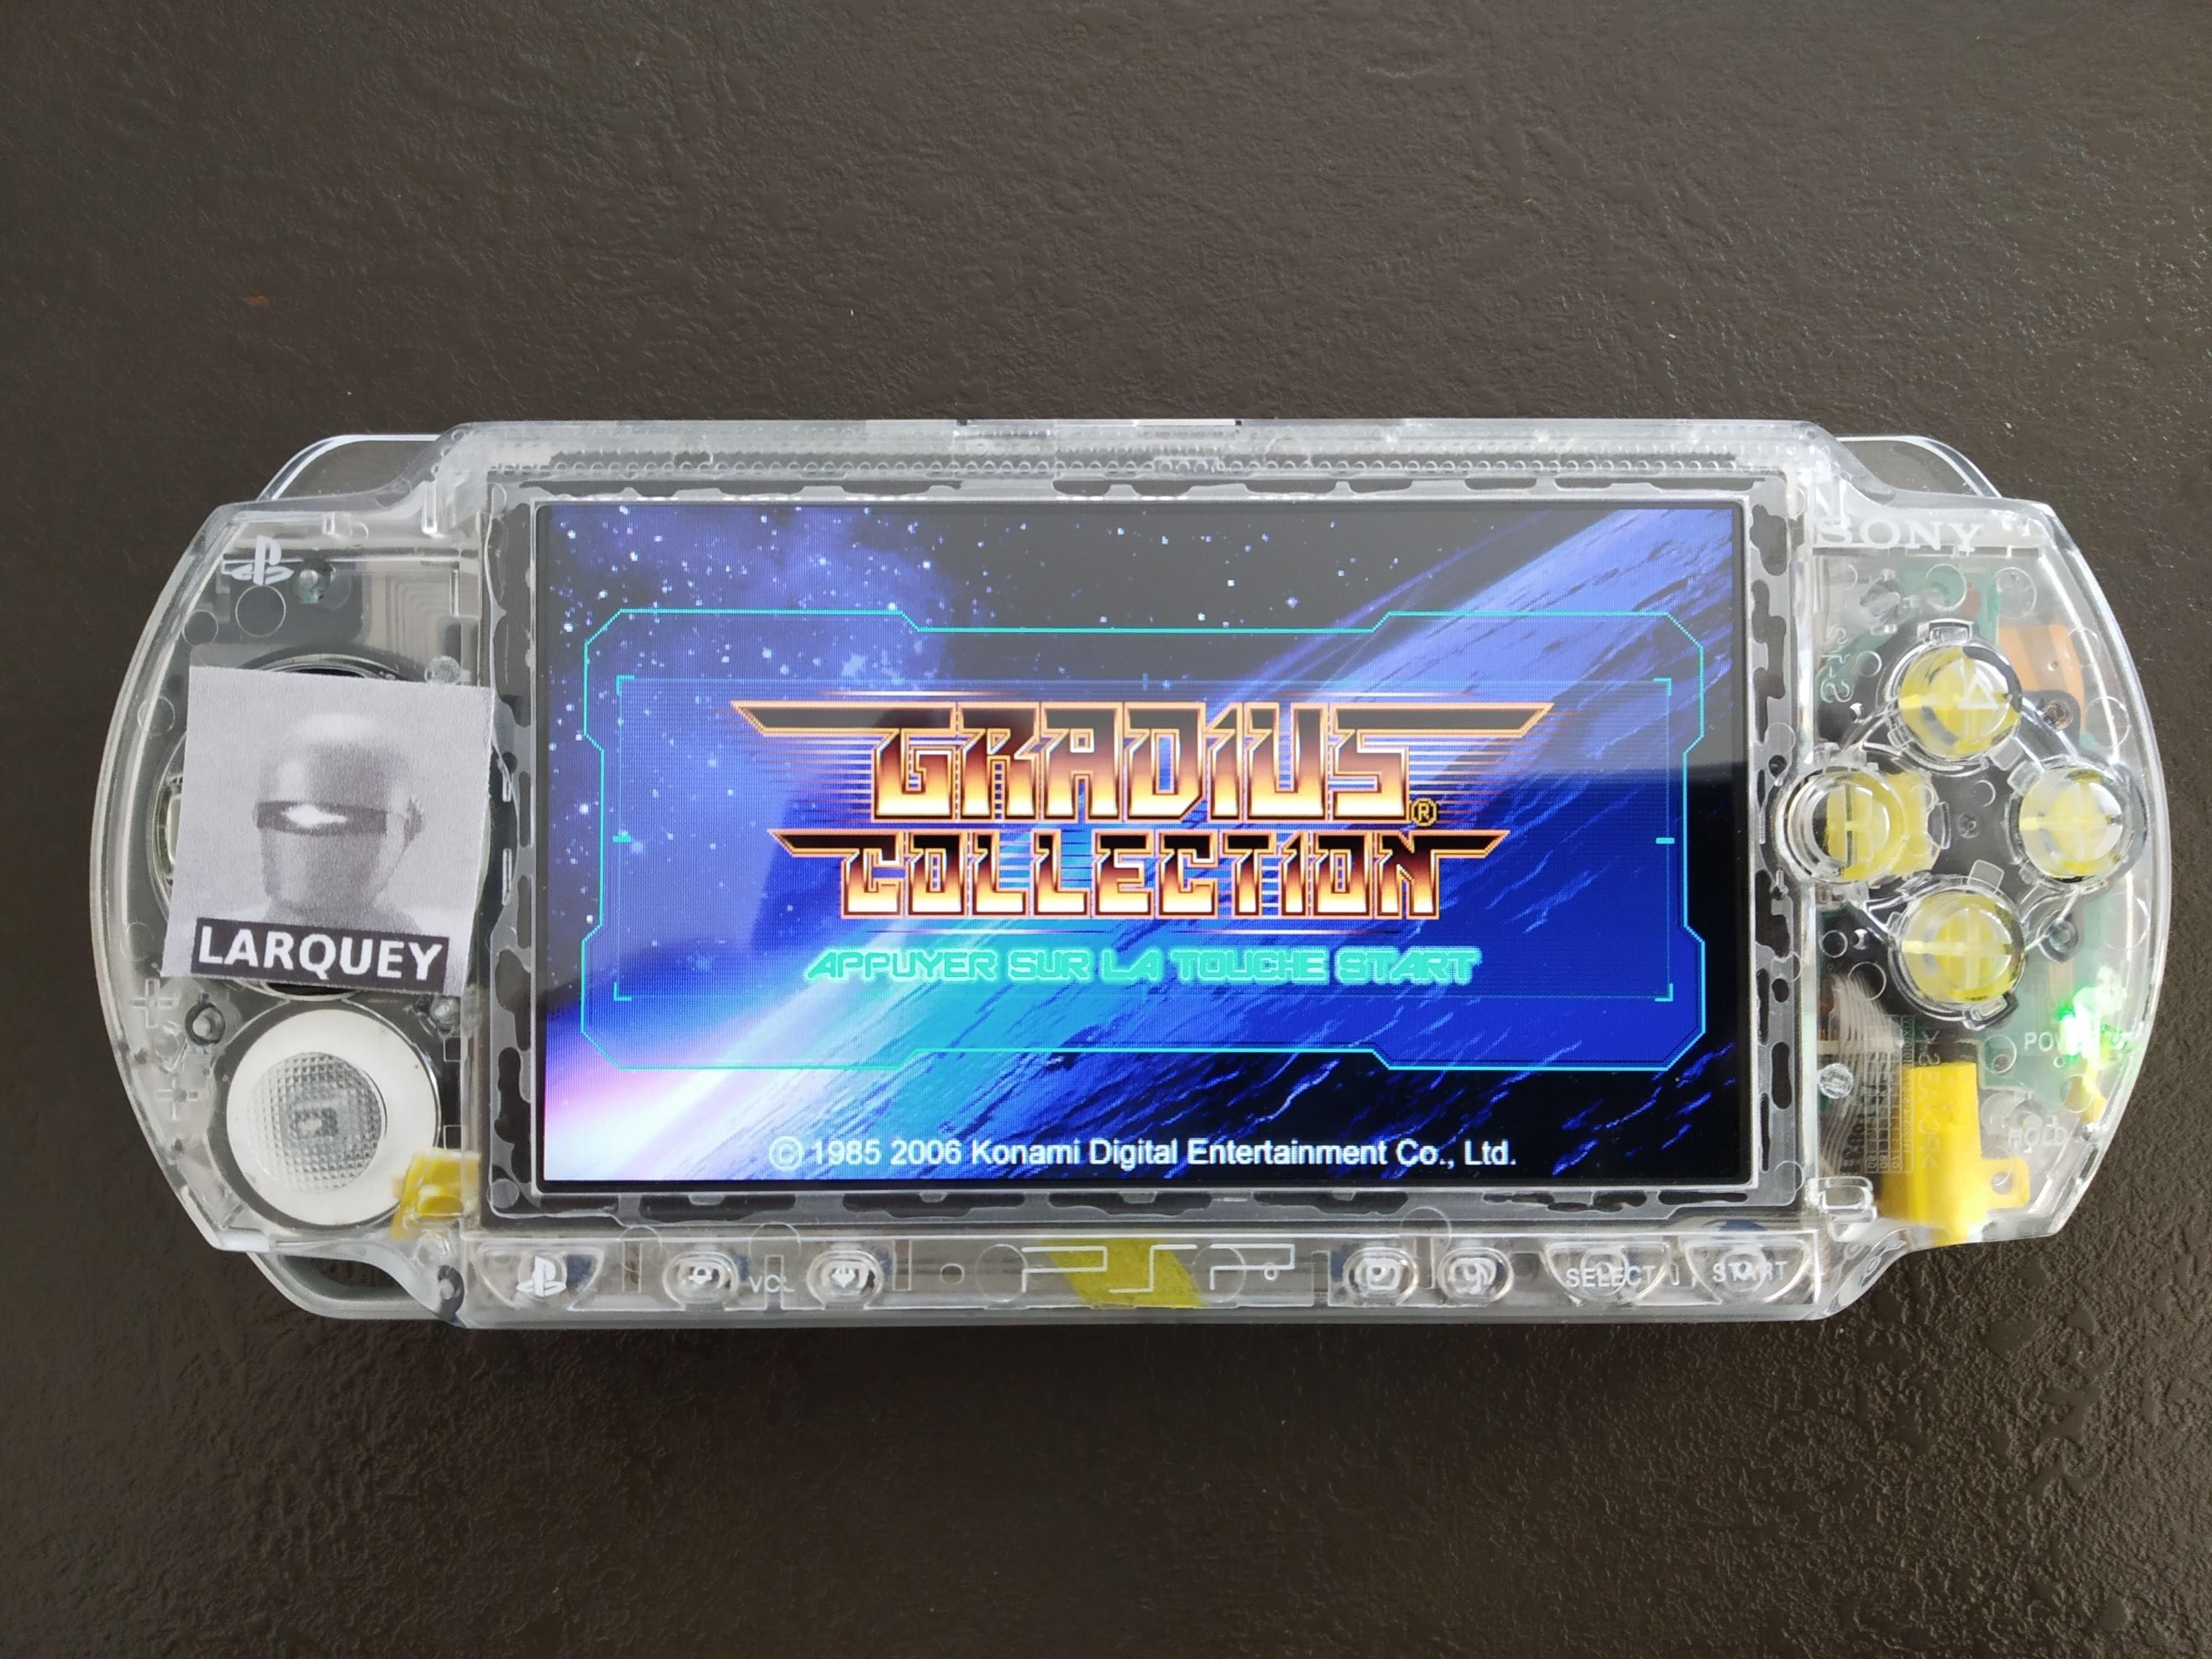 Larquey: Gradius Portable [aka Gradius Collection]: Gradius (PSP) 89,400 points on 2020-07-26 05:06:07